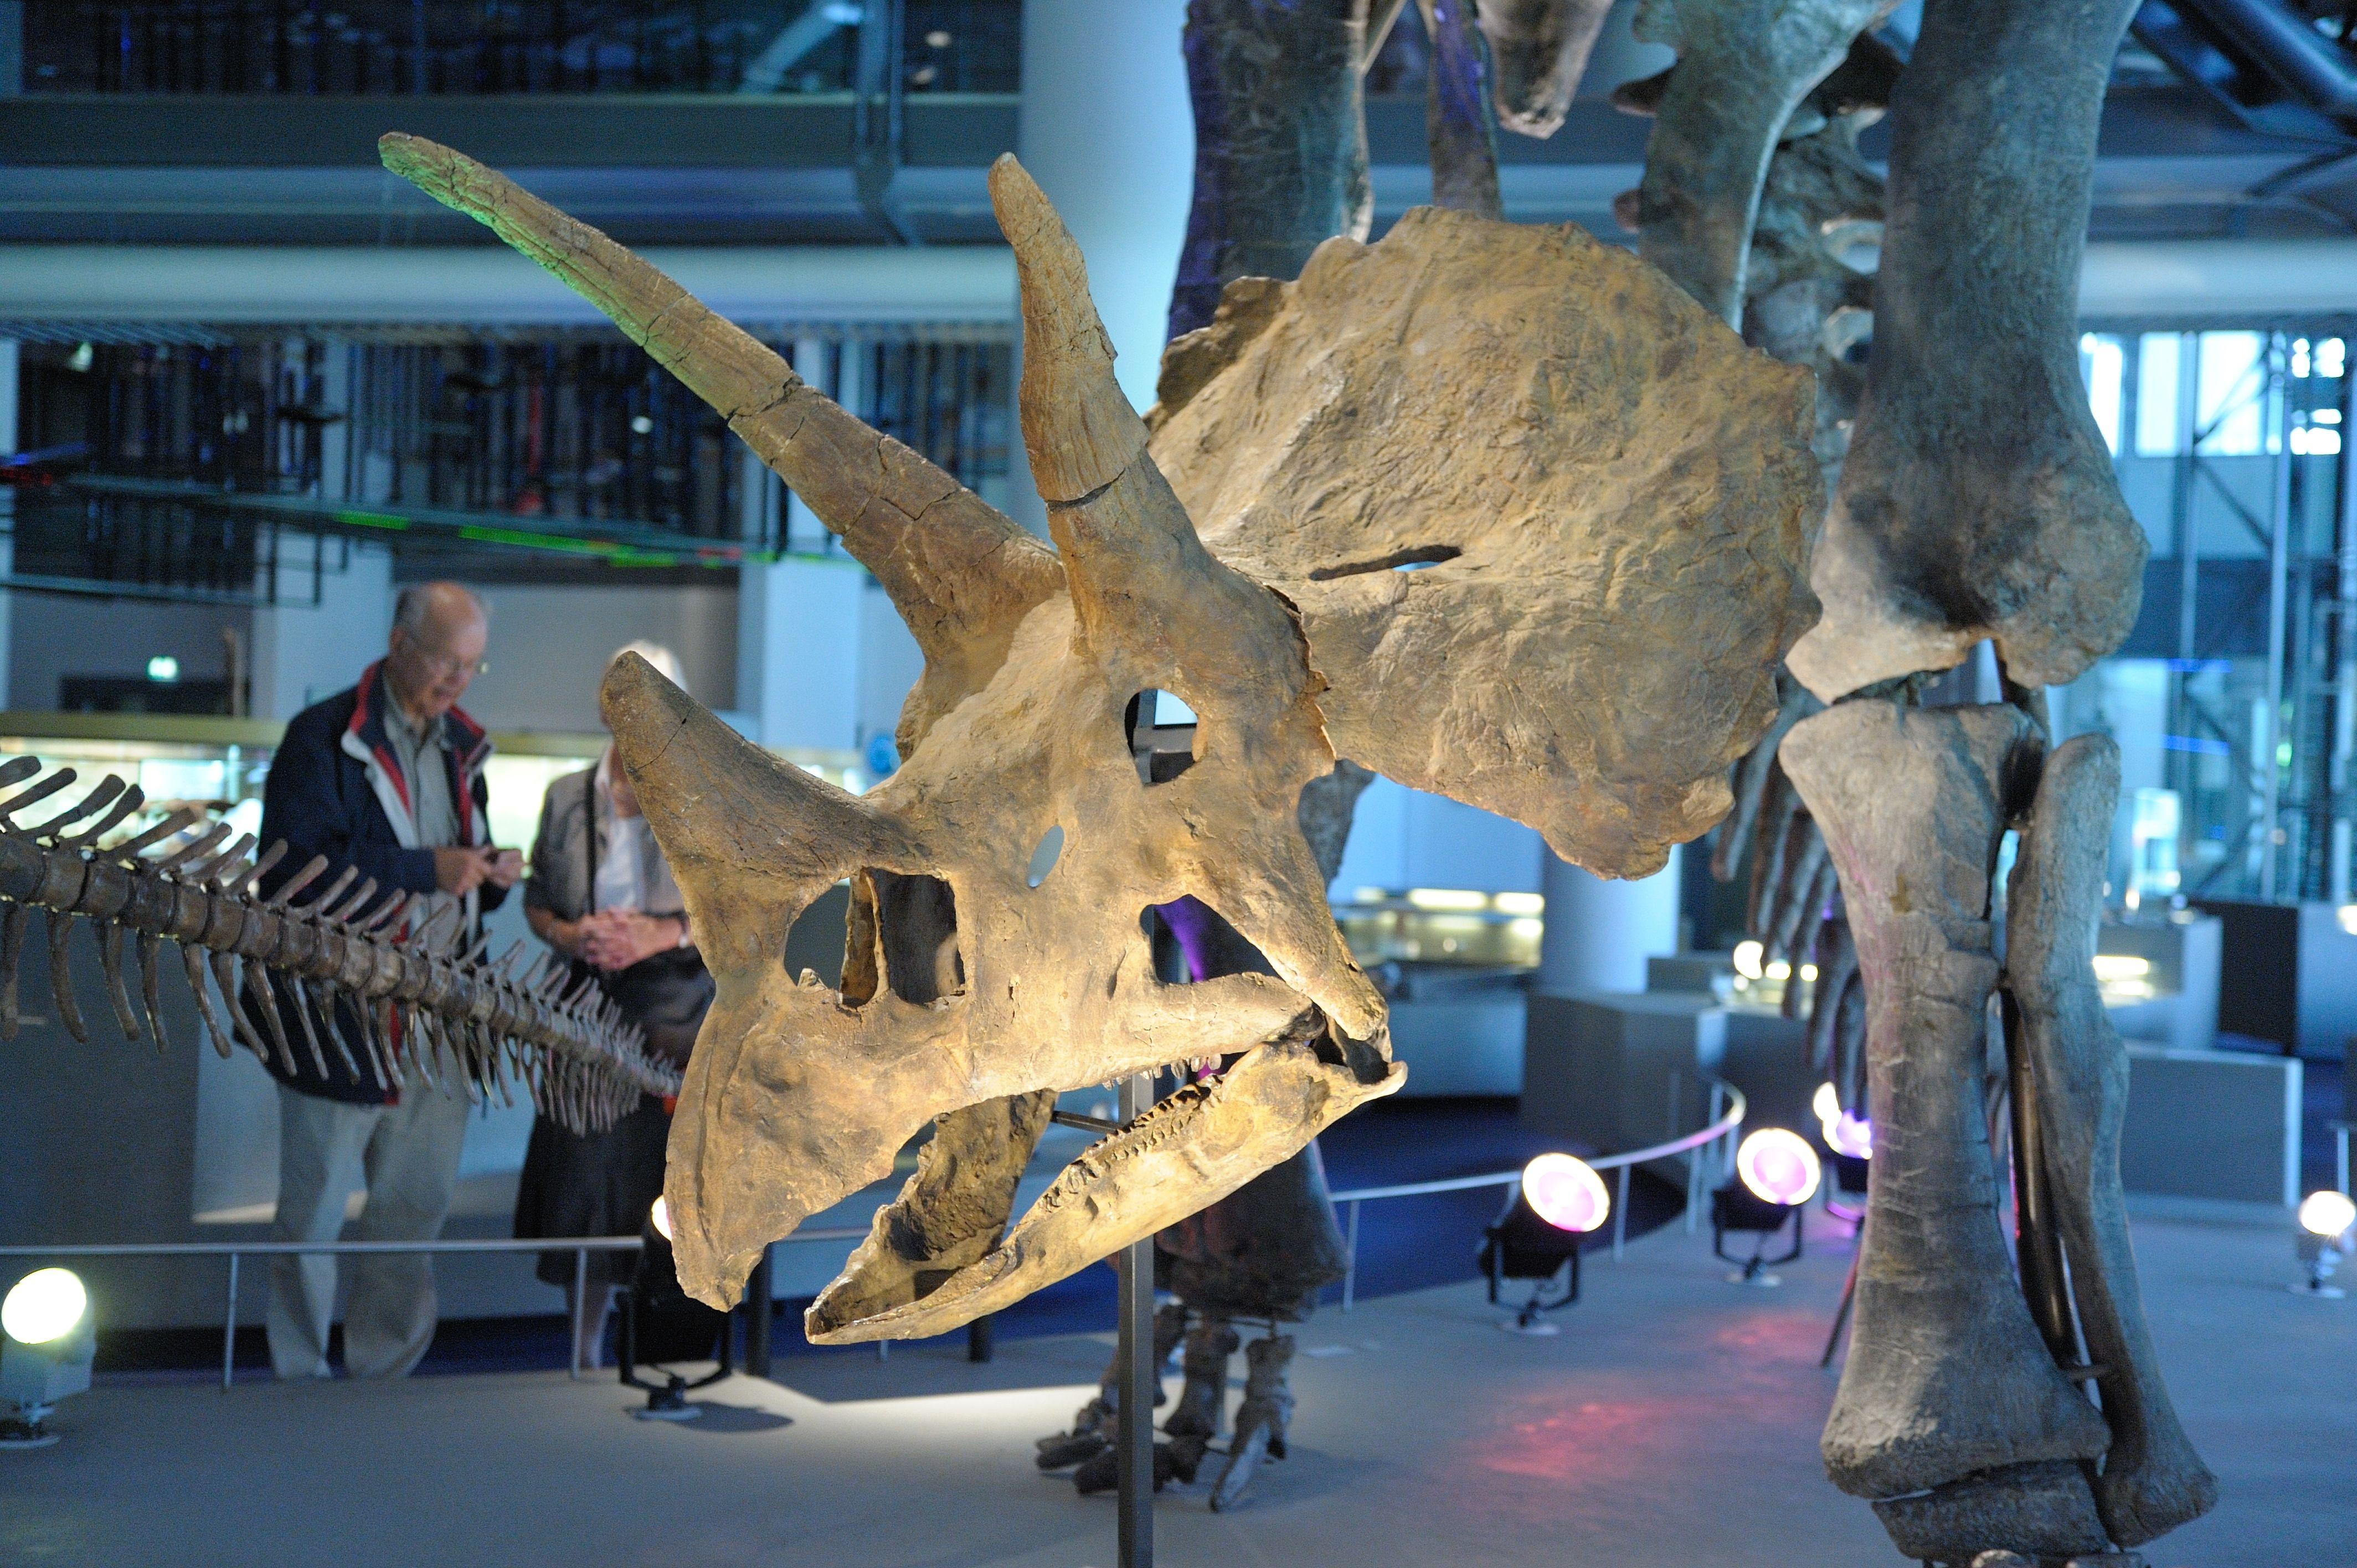 Triceratops In Oerparade Naturalis